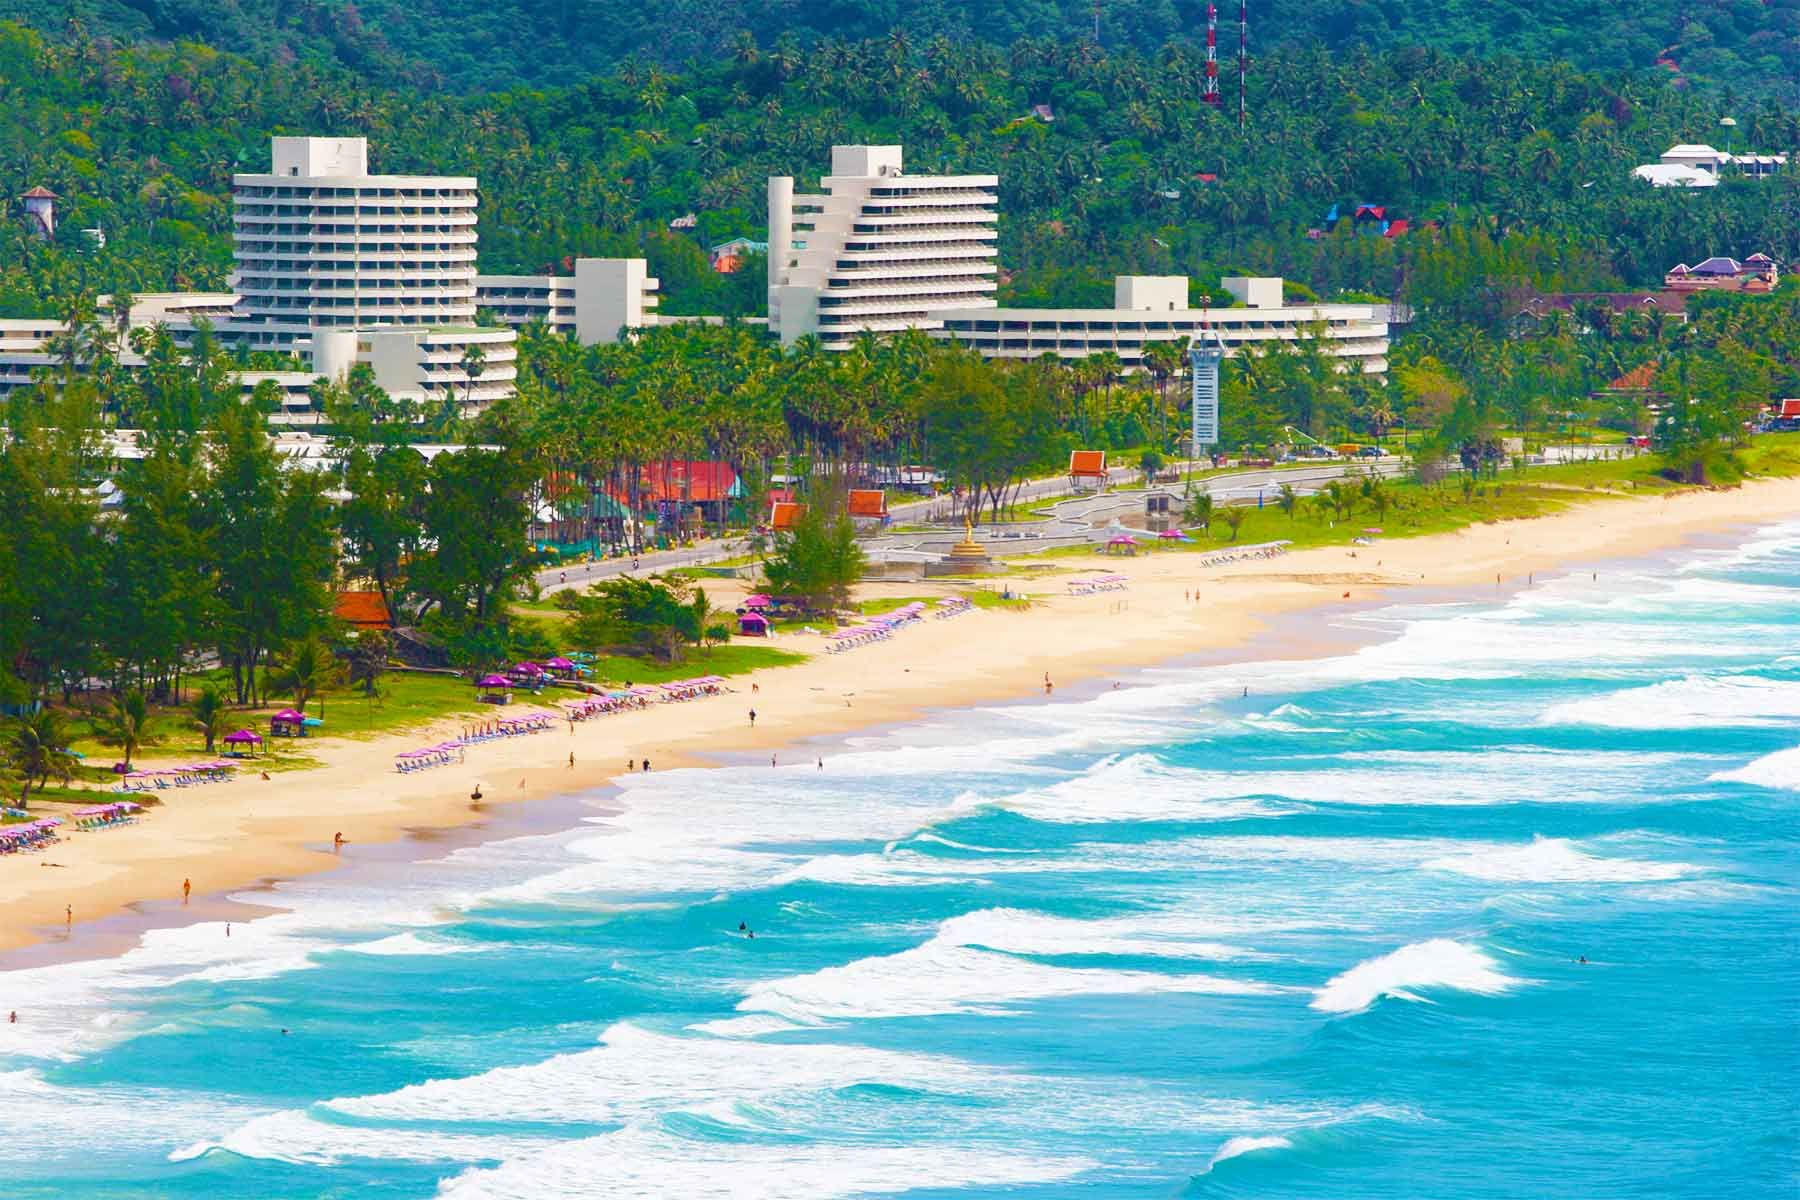 Surfing Thailand | Hotel and Tourism Management | Dr Steven A Martin | Surf Tourism Research | Andaman Coast, Phuket